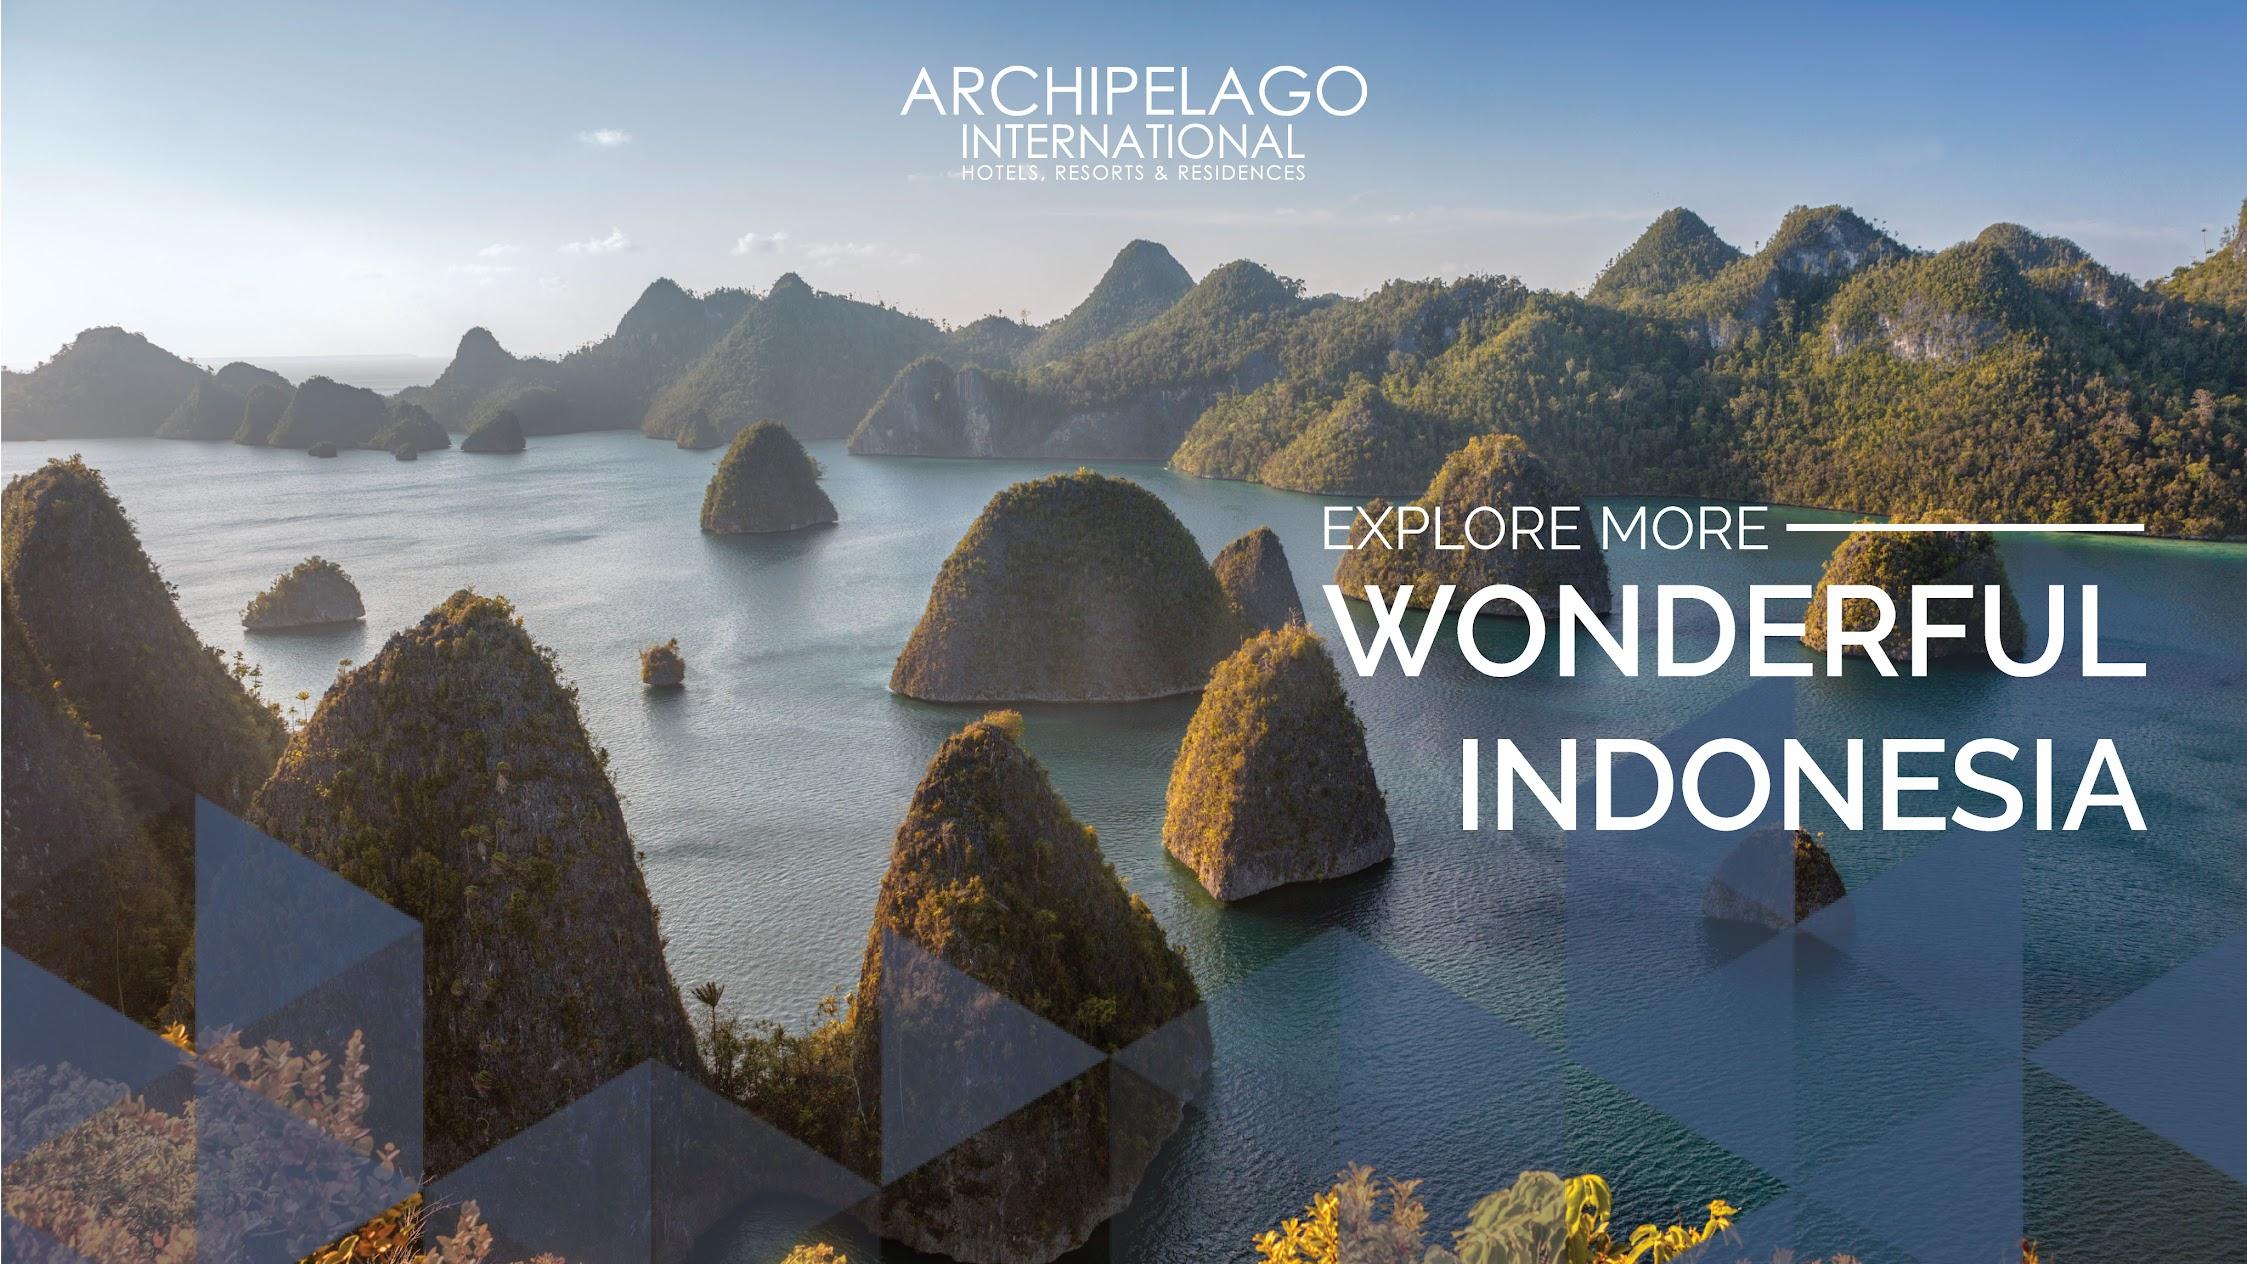 Archipelago International Hotels and Resorts